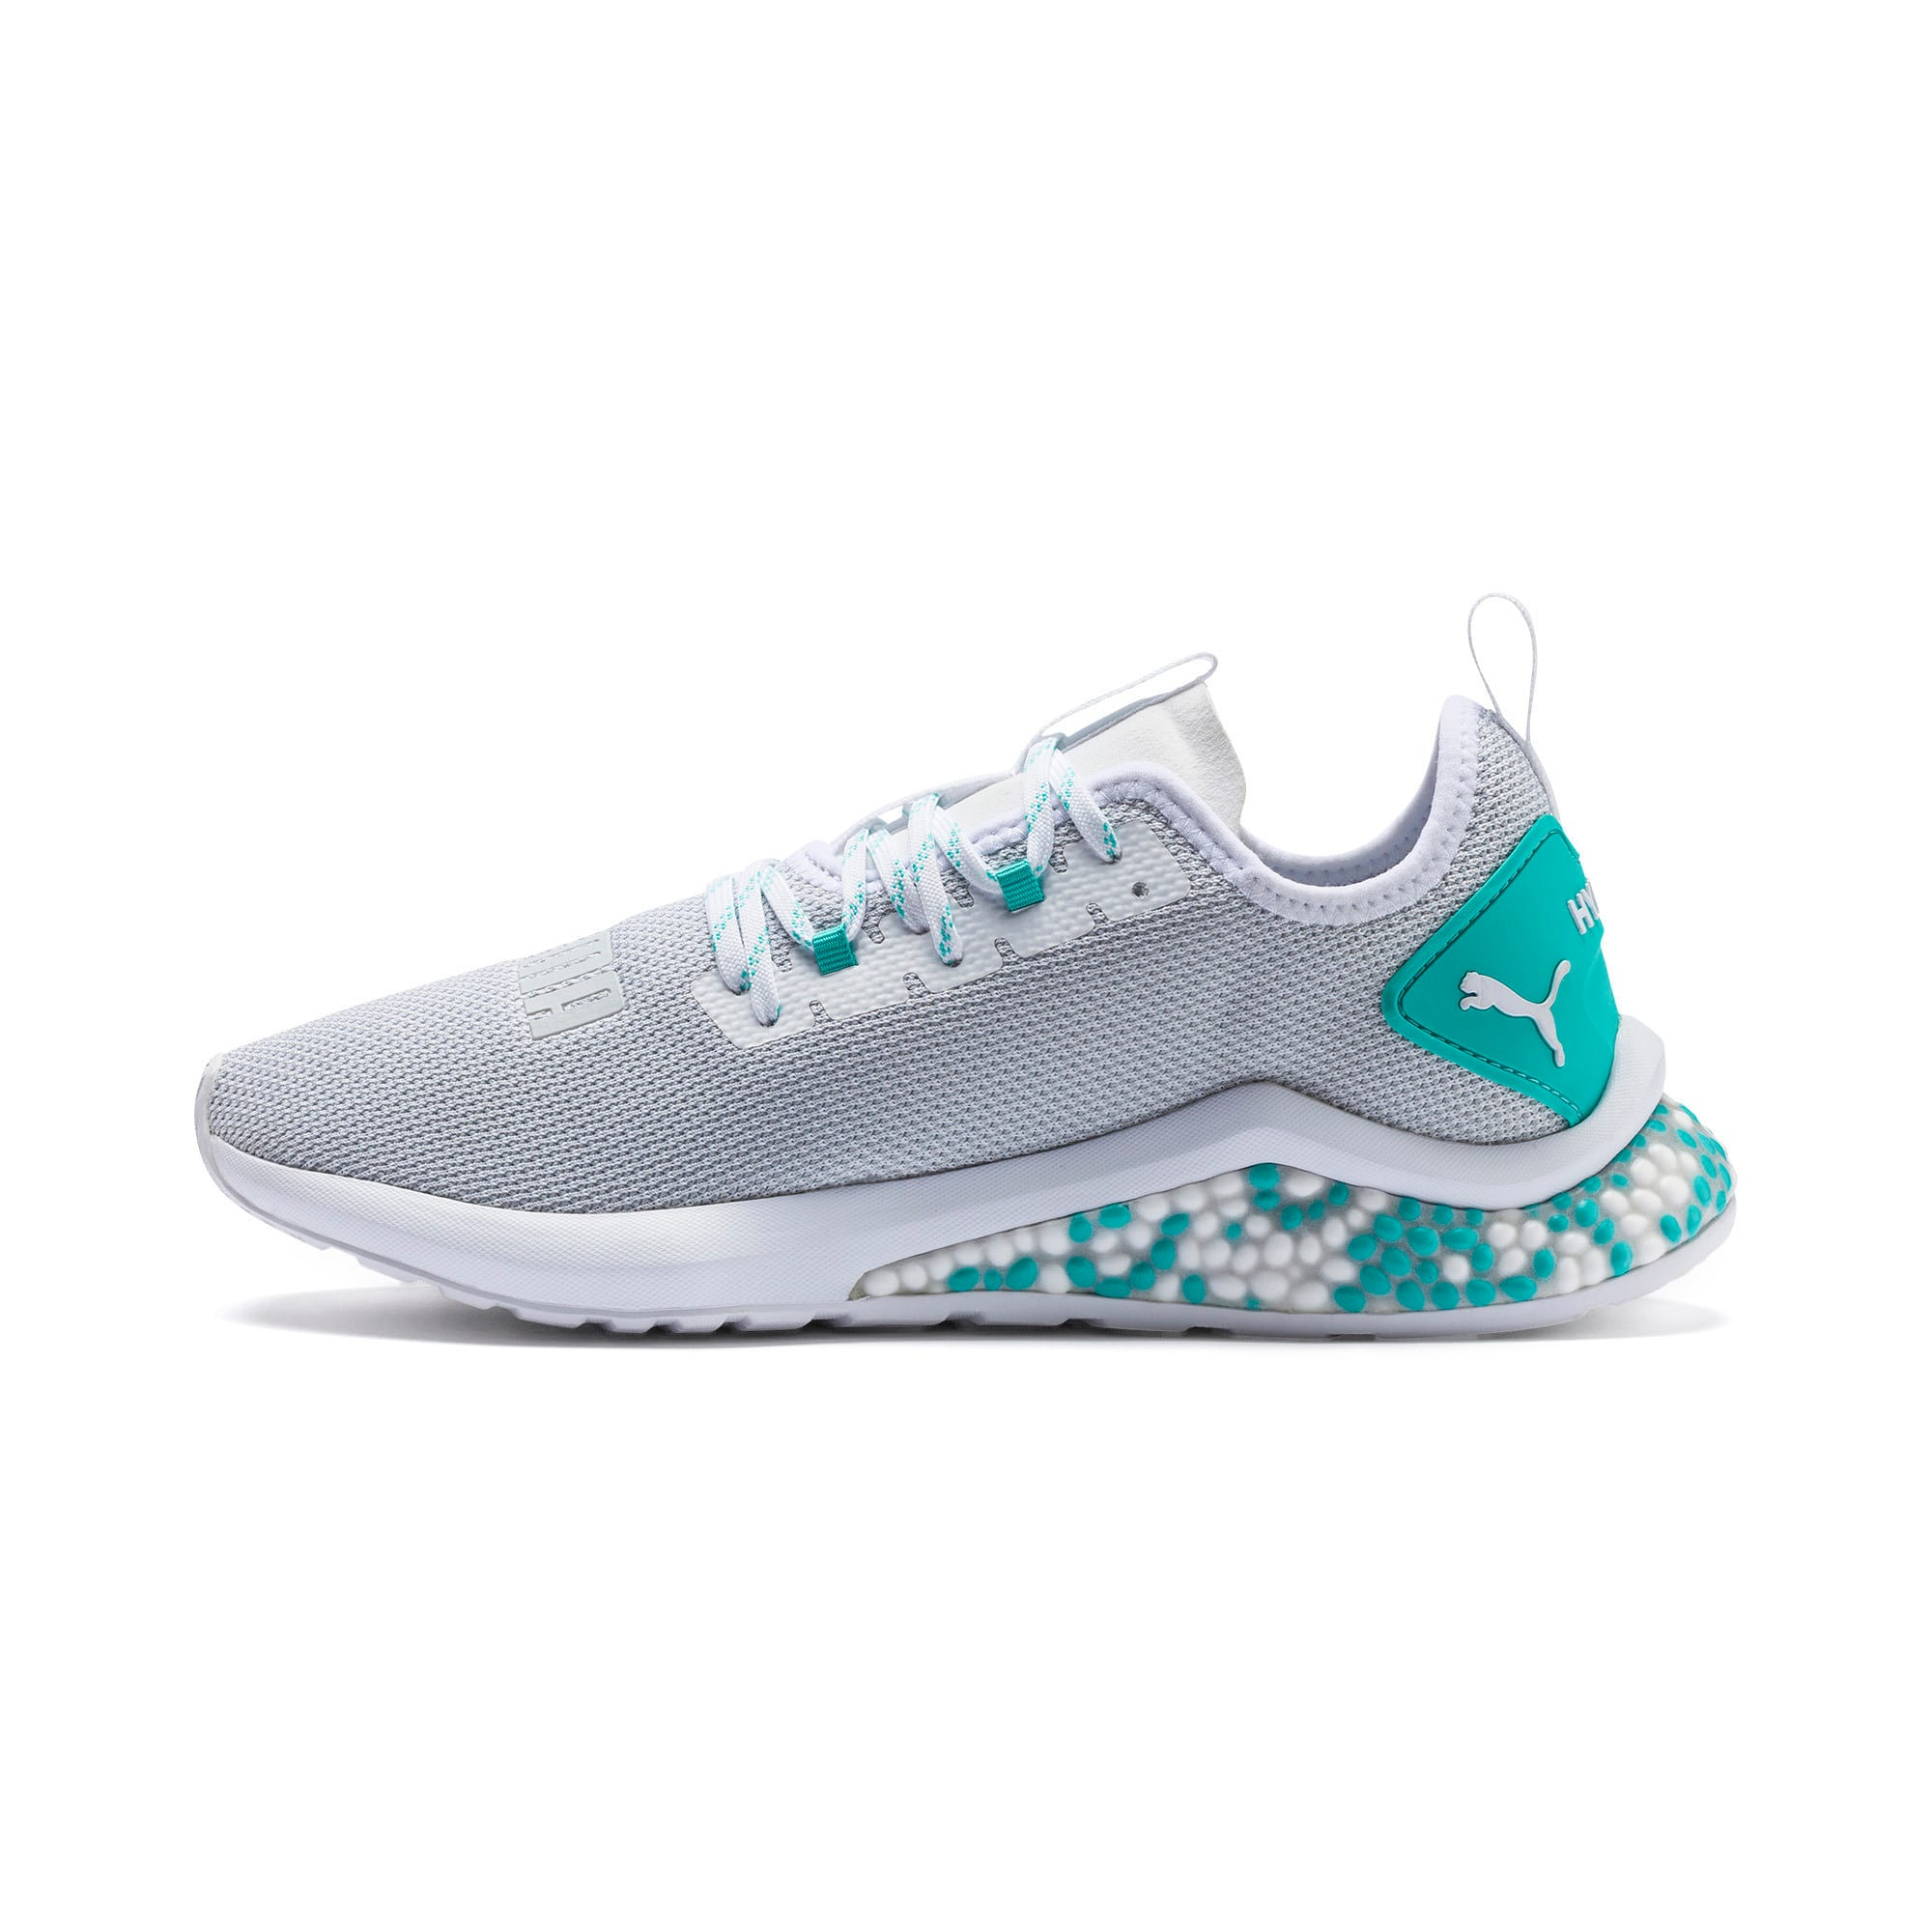 Thumbnail 1 of HYBRID NX Men's Running Shoes, Puma White-Blue Turquoise, medium